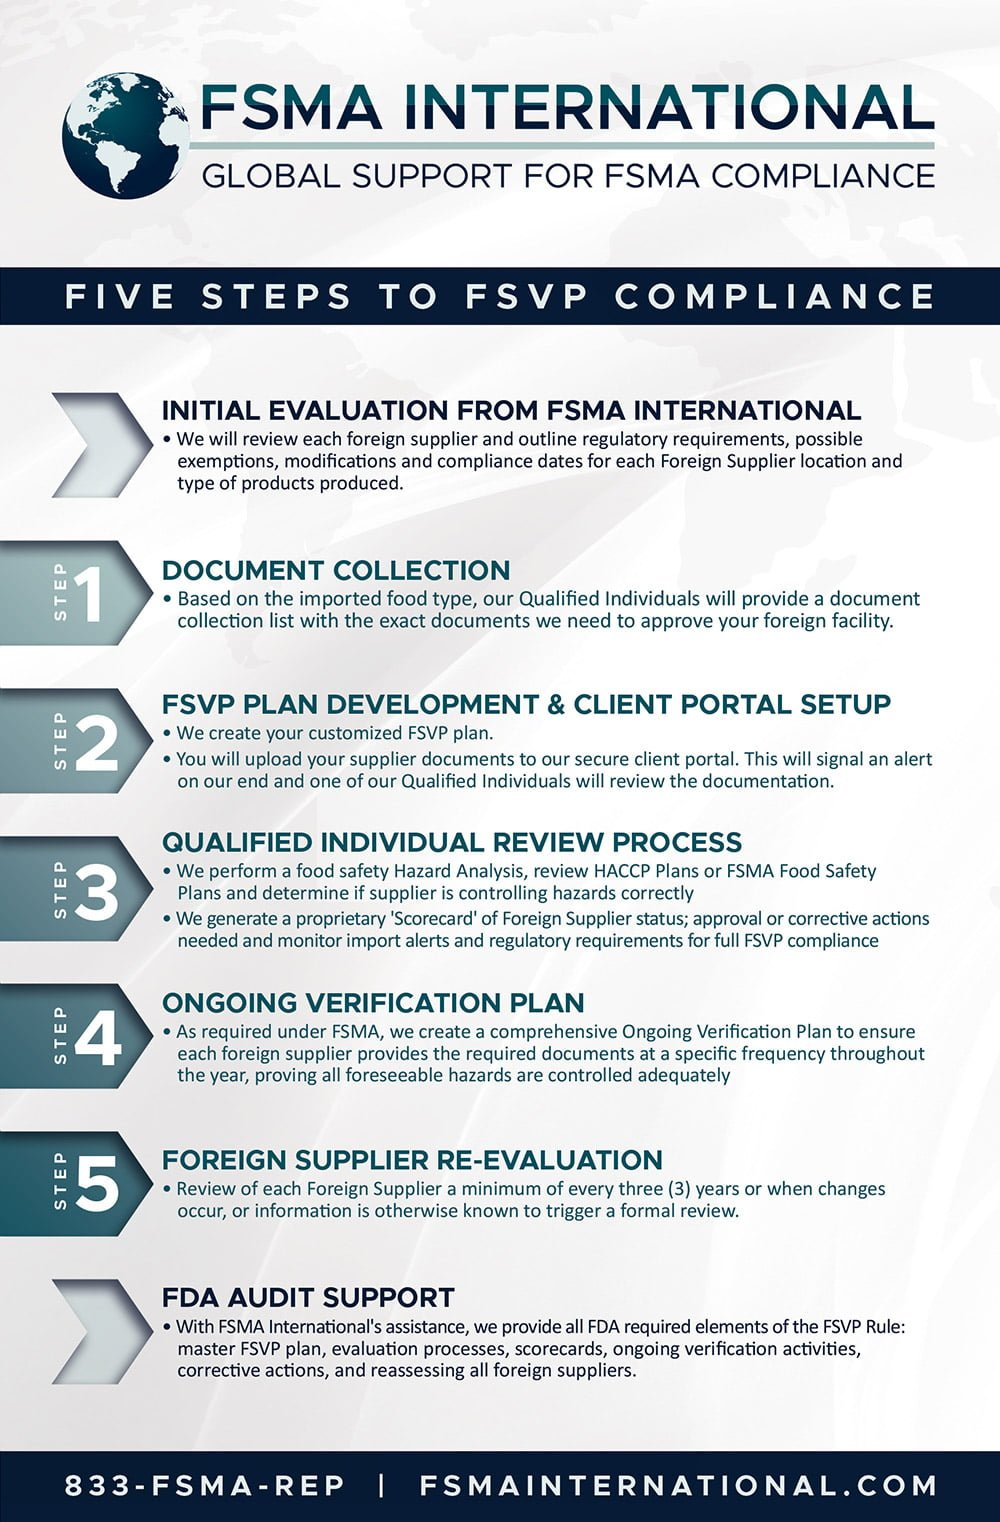 5 Steps to FSVP Compliance